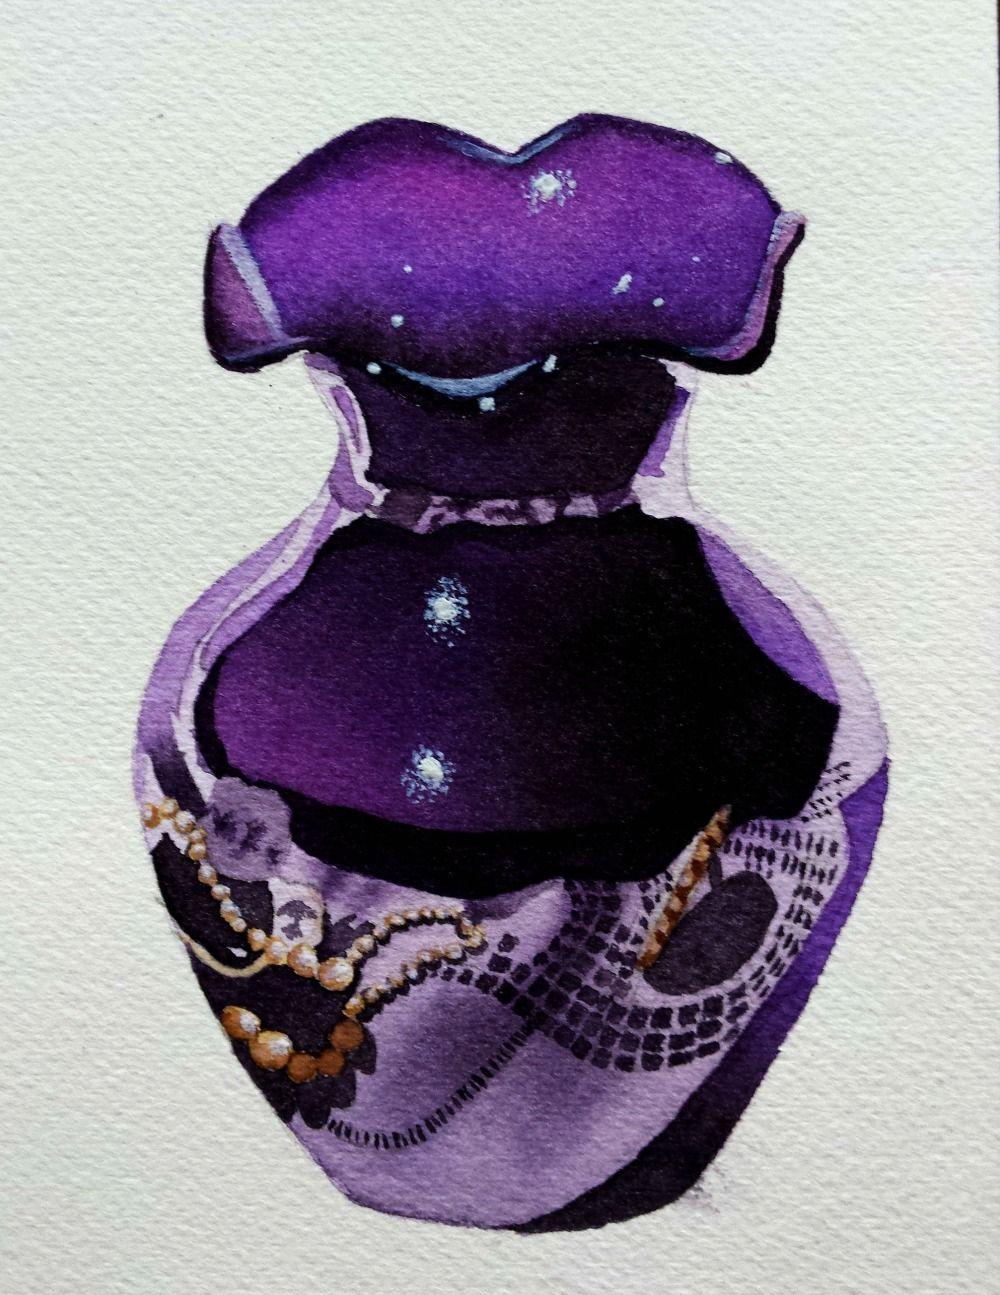 My Purple Vase - members watercolors - For the Love of Watercolor